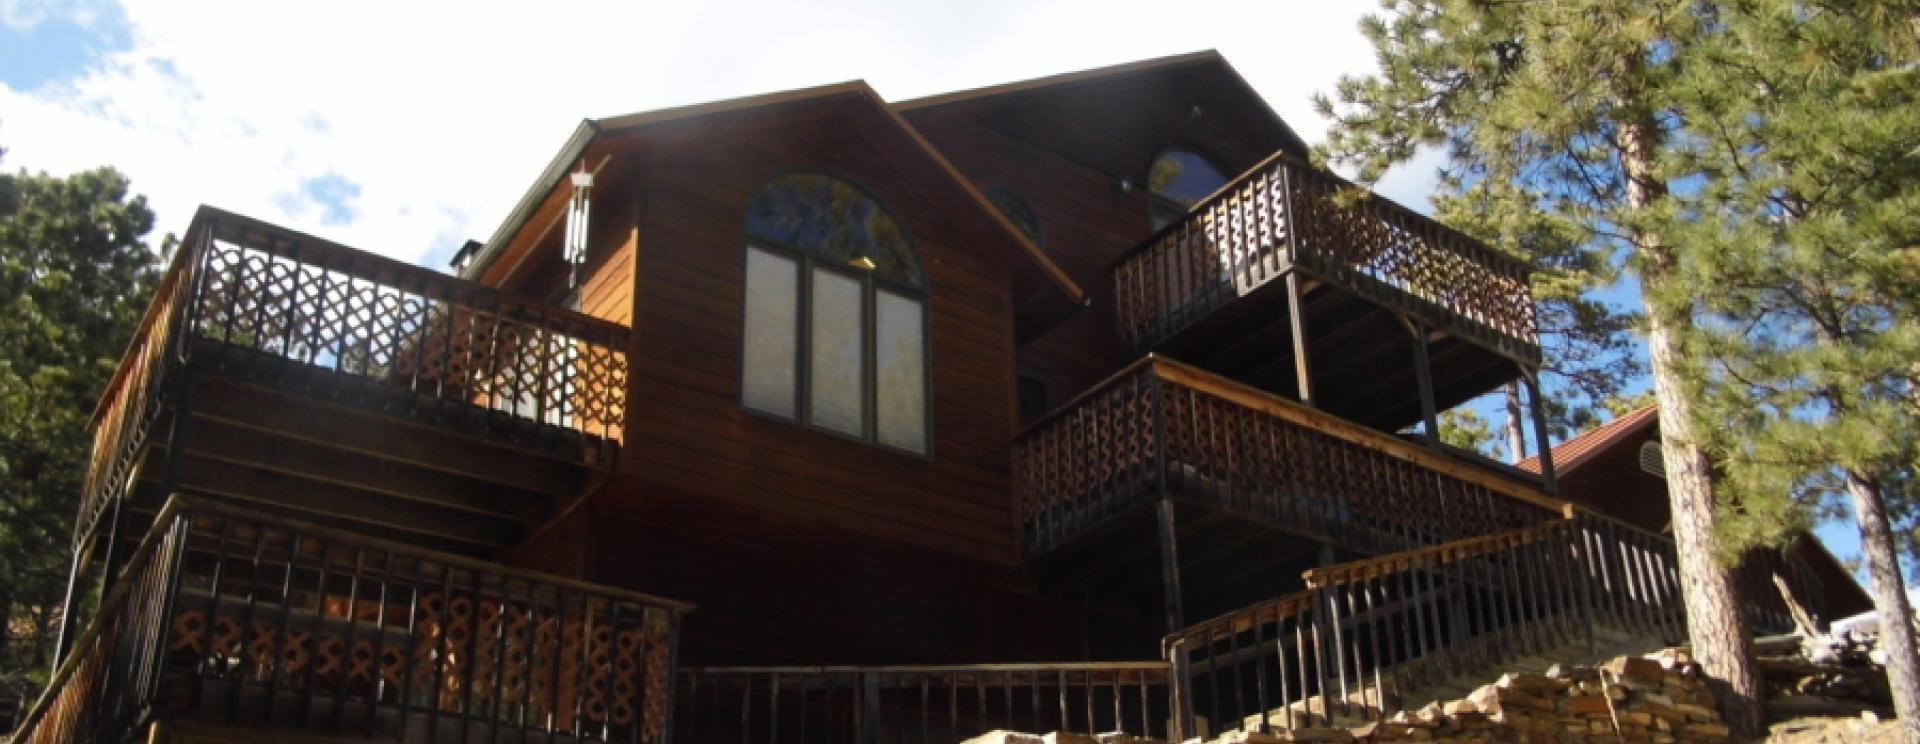 Edelweiss Mountain Lodge